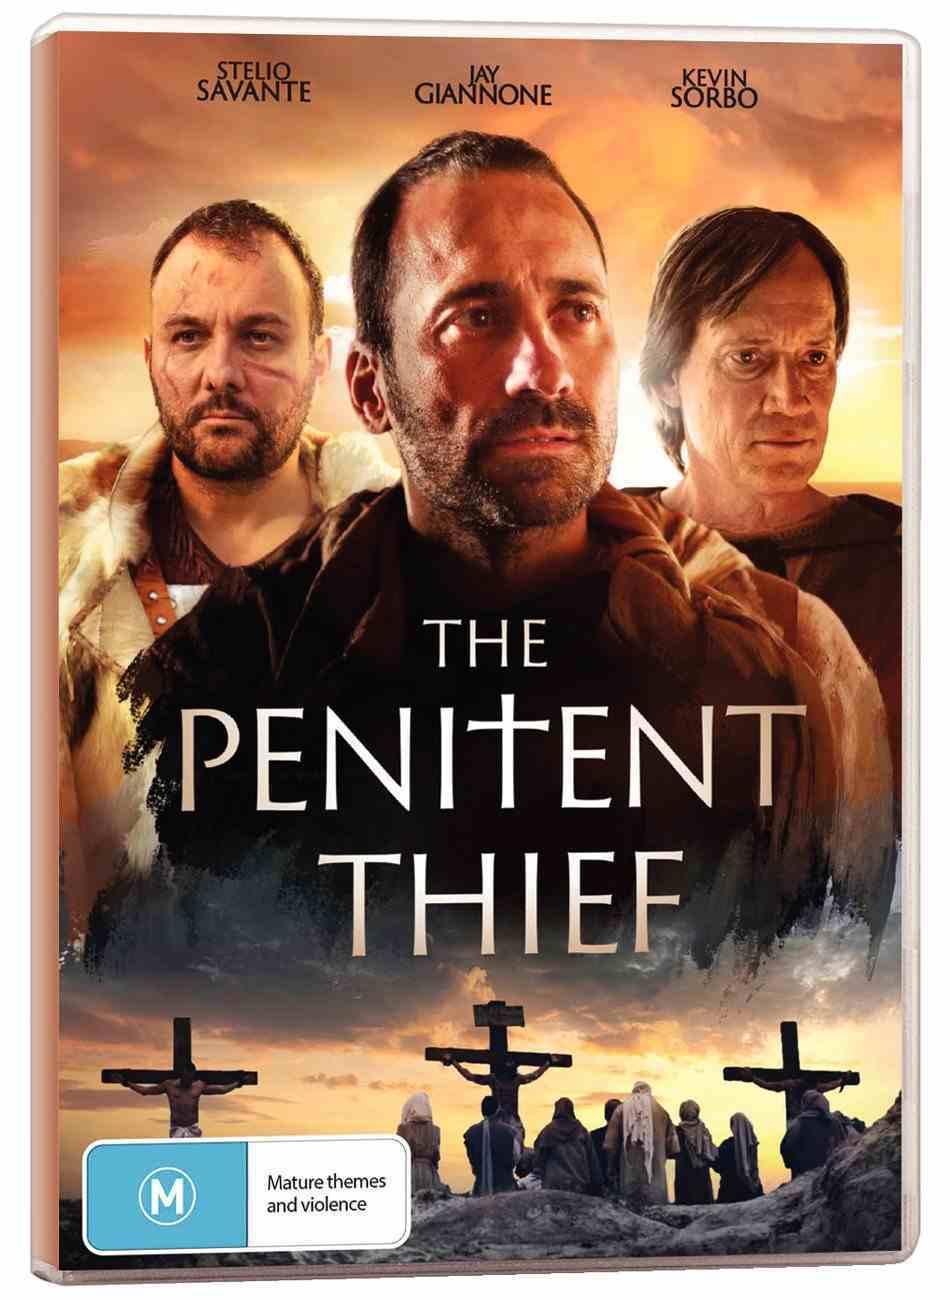 The Penitent Thief (2021 Movie) DVD